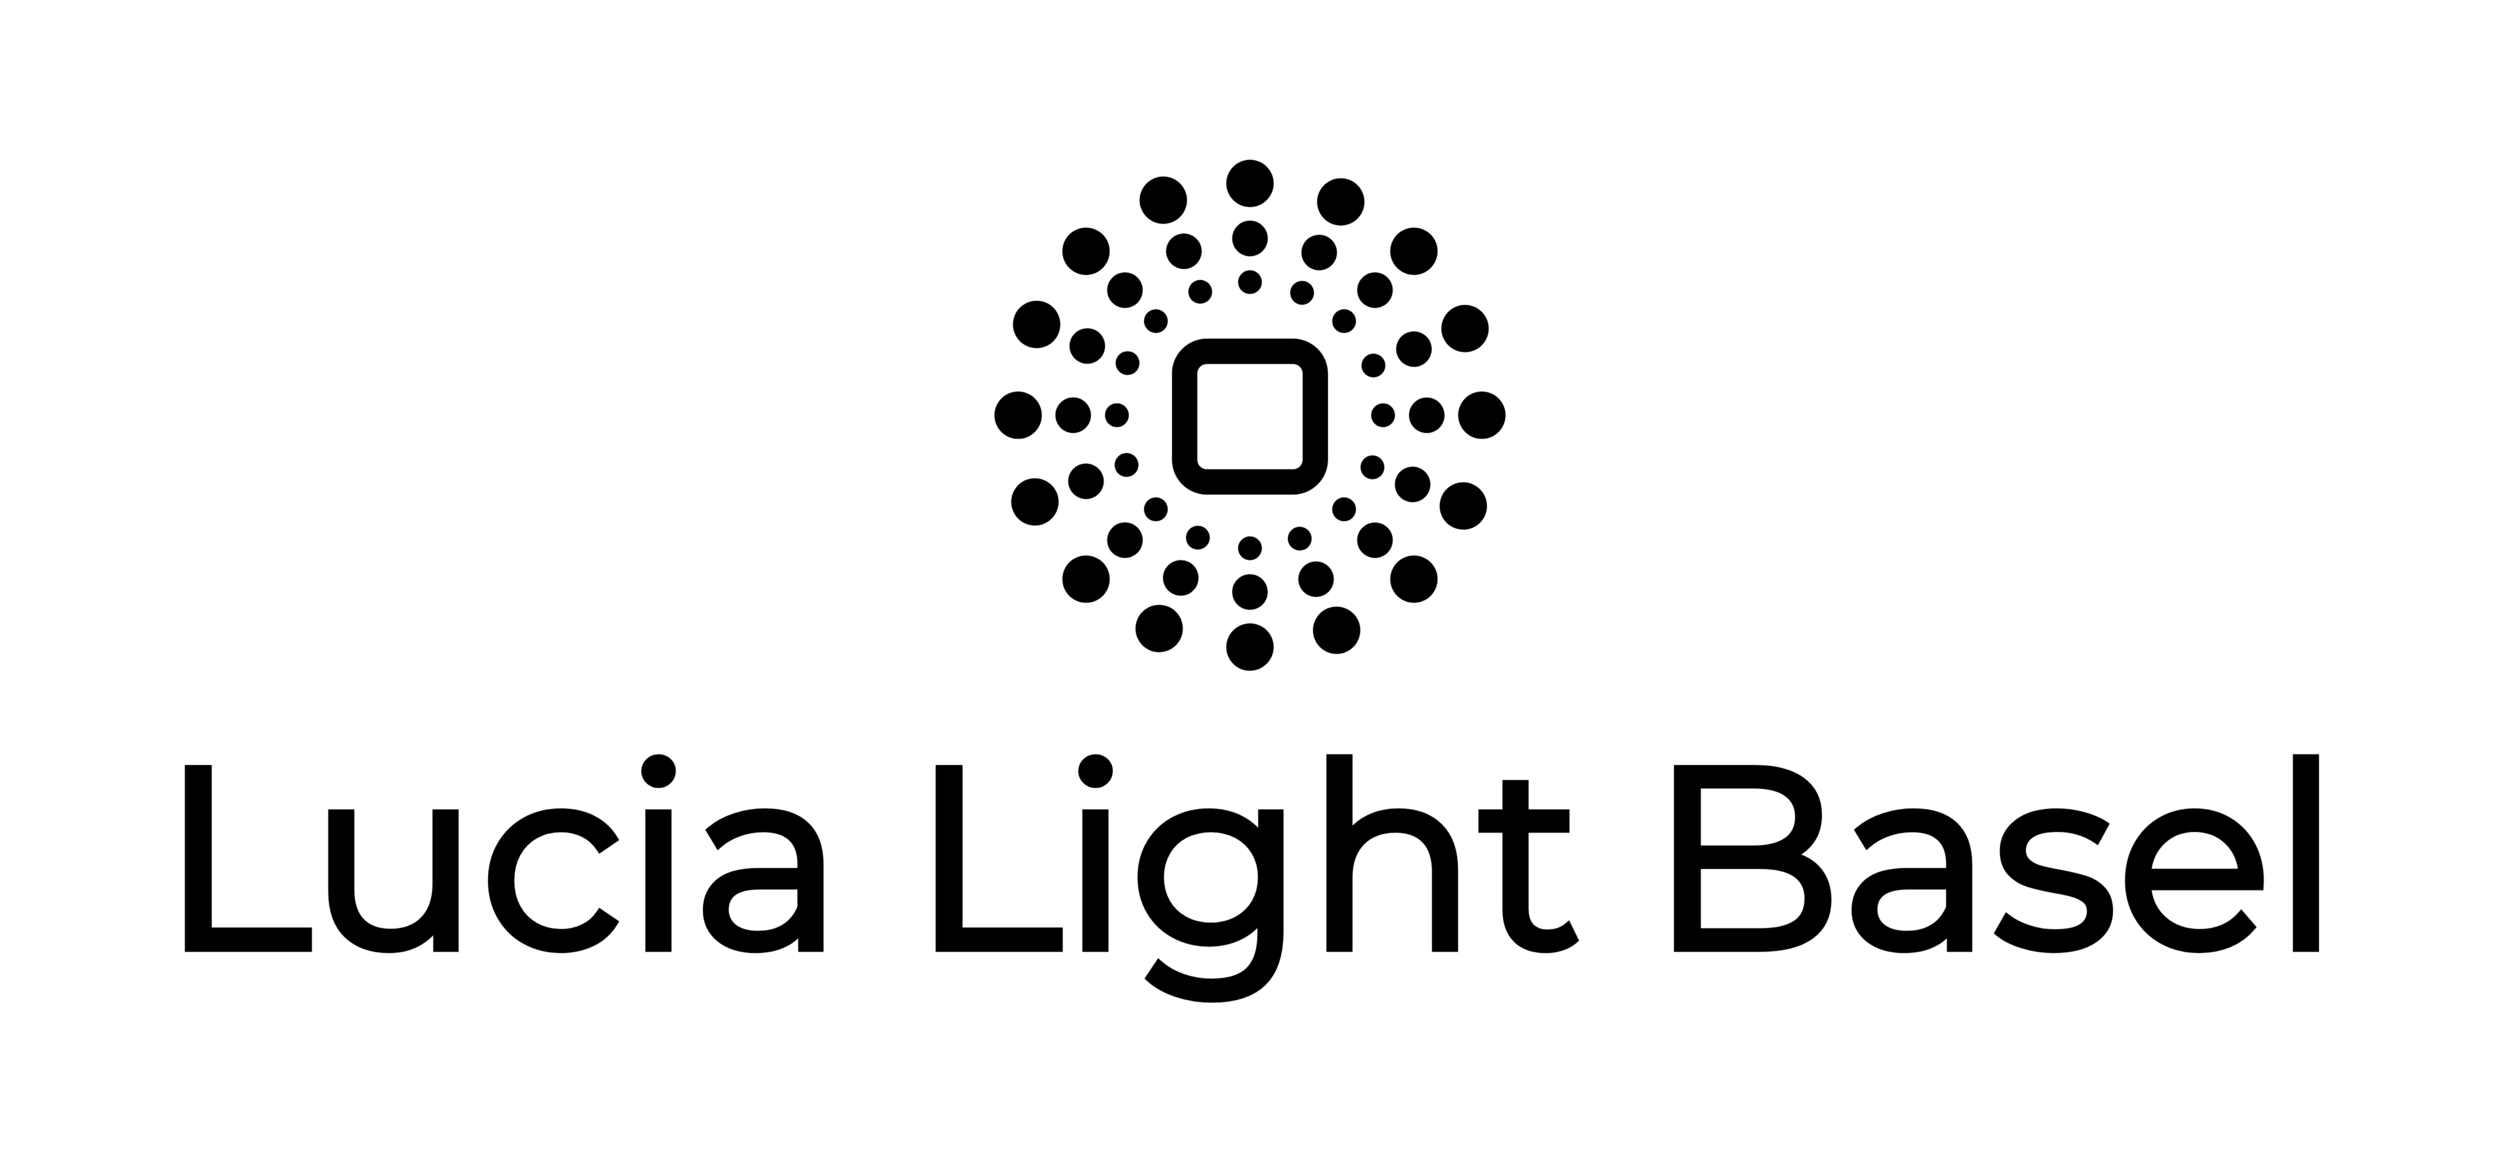 Lucia Light Basel-logo-black (5000).png